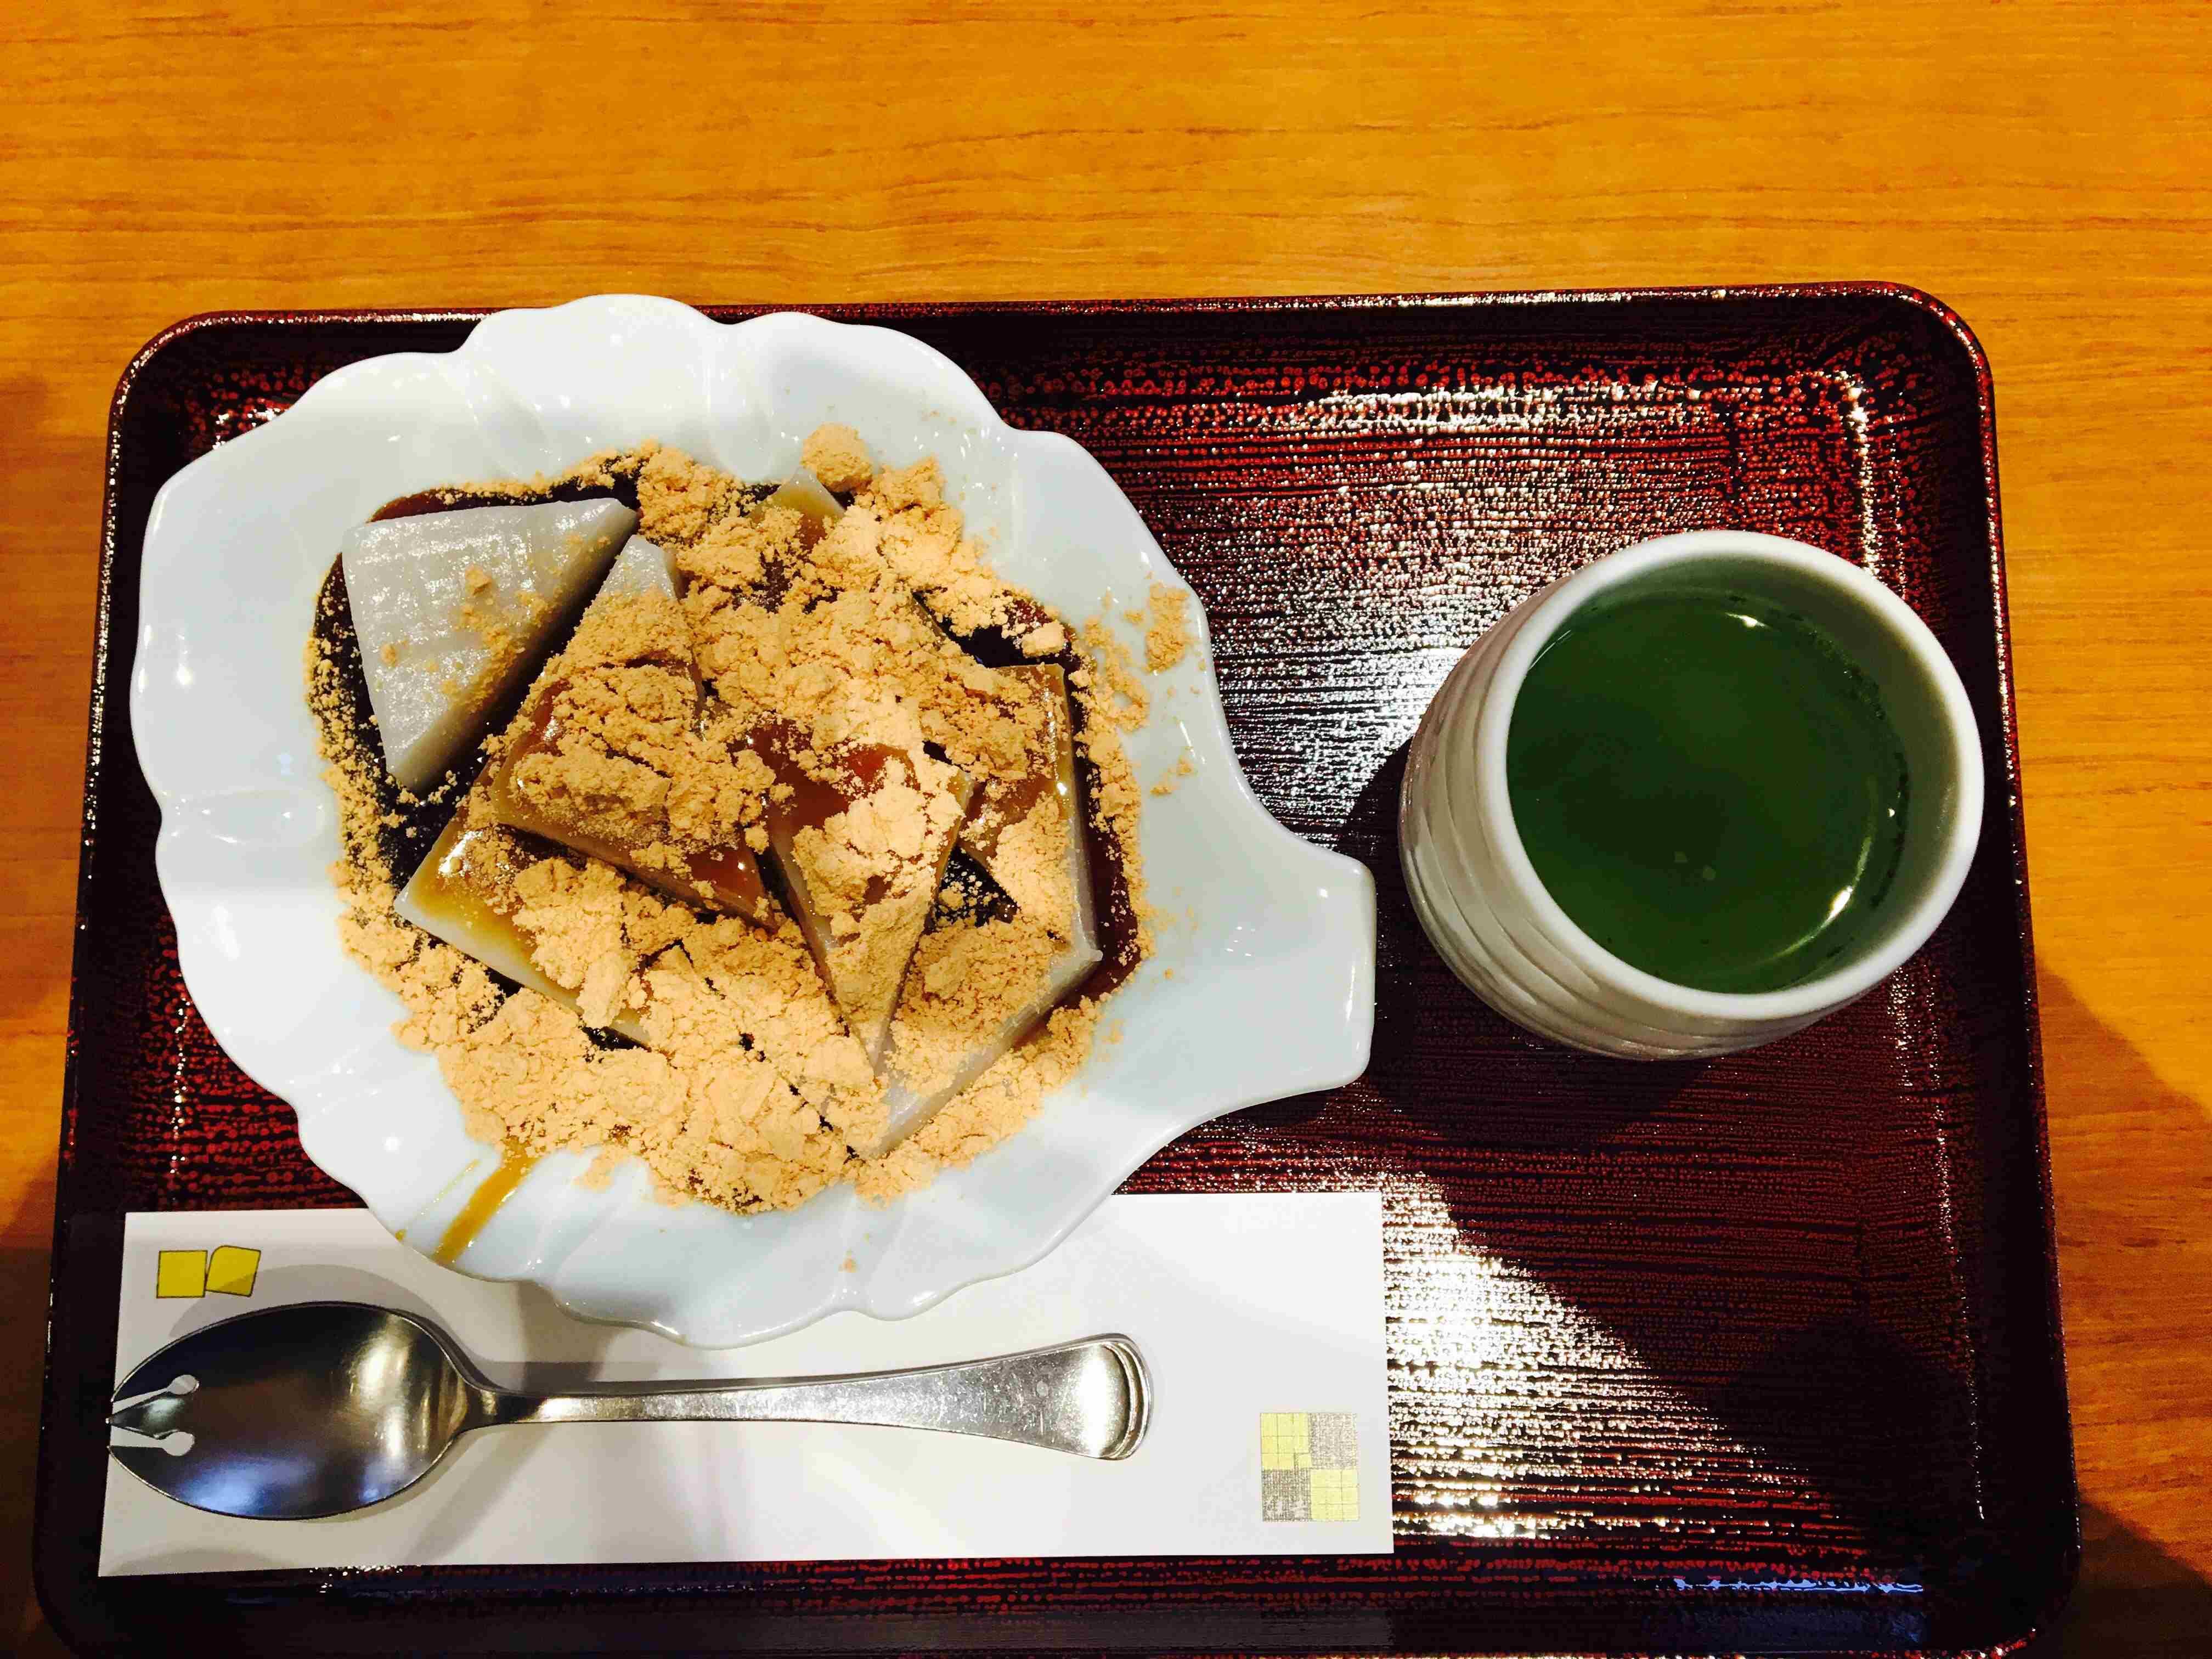 Chuẩn bị trà/お茶の準備